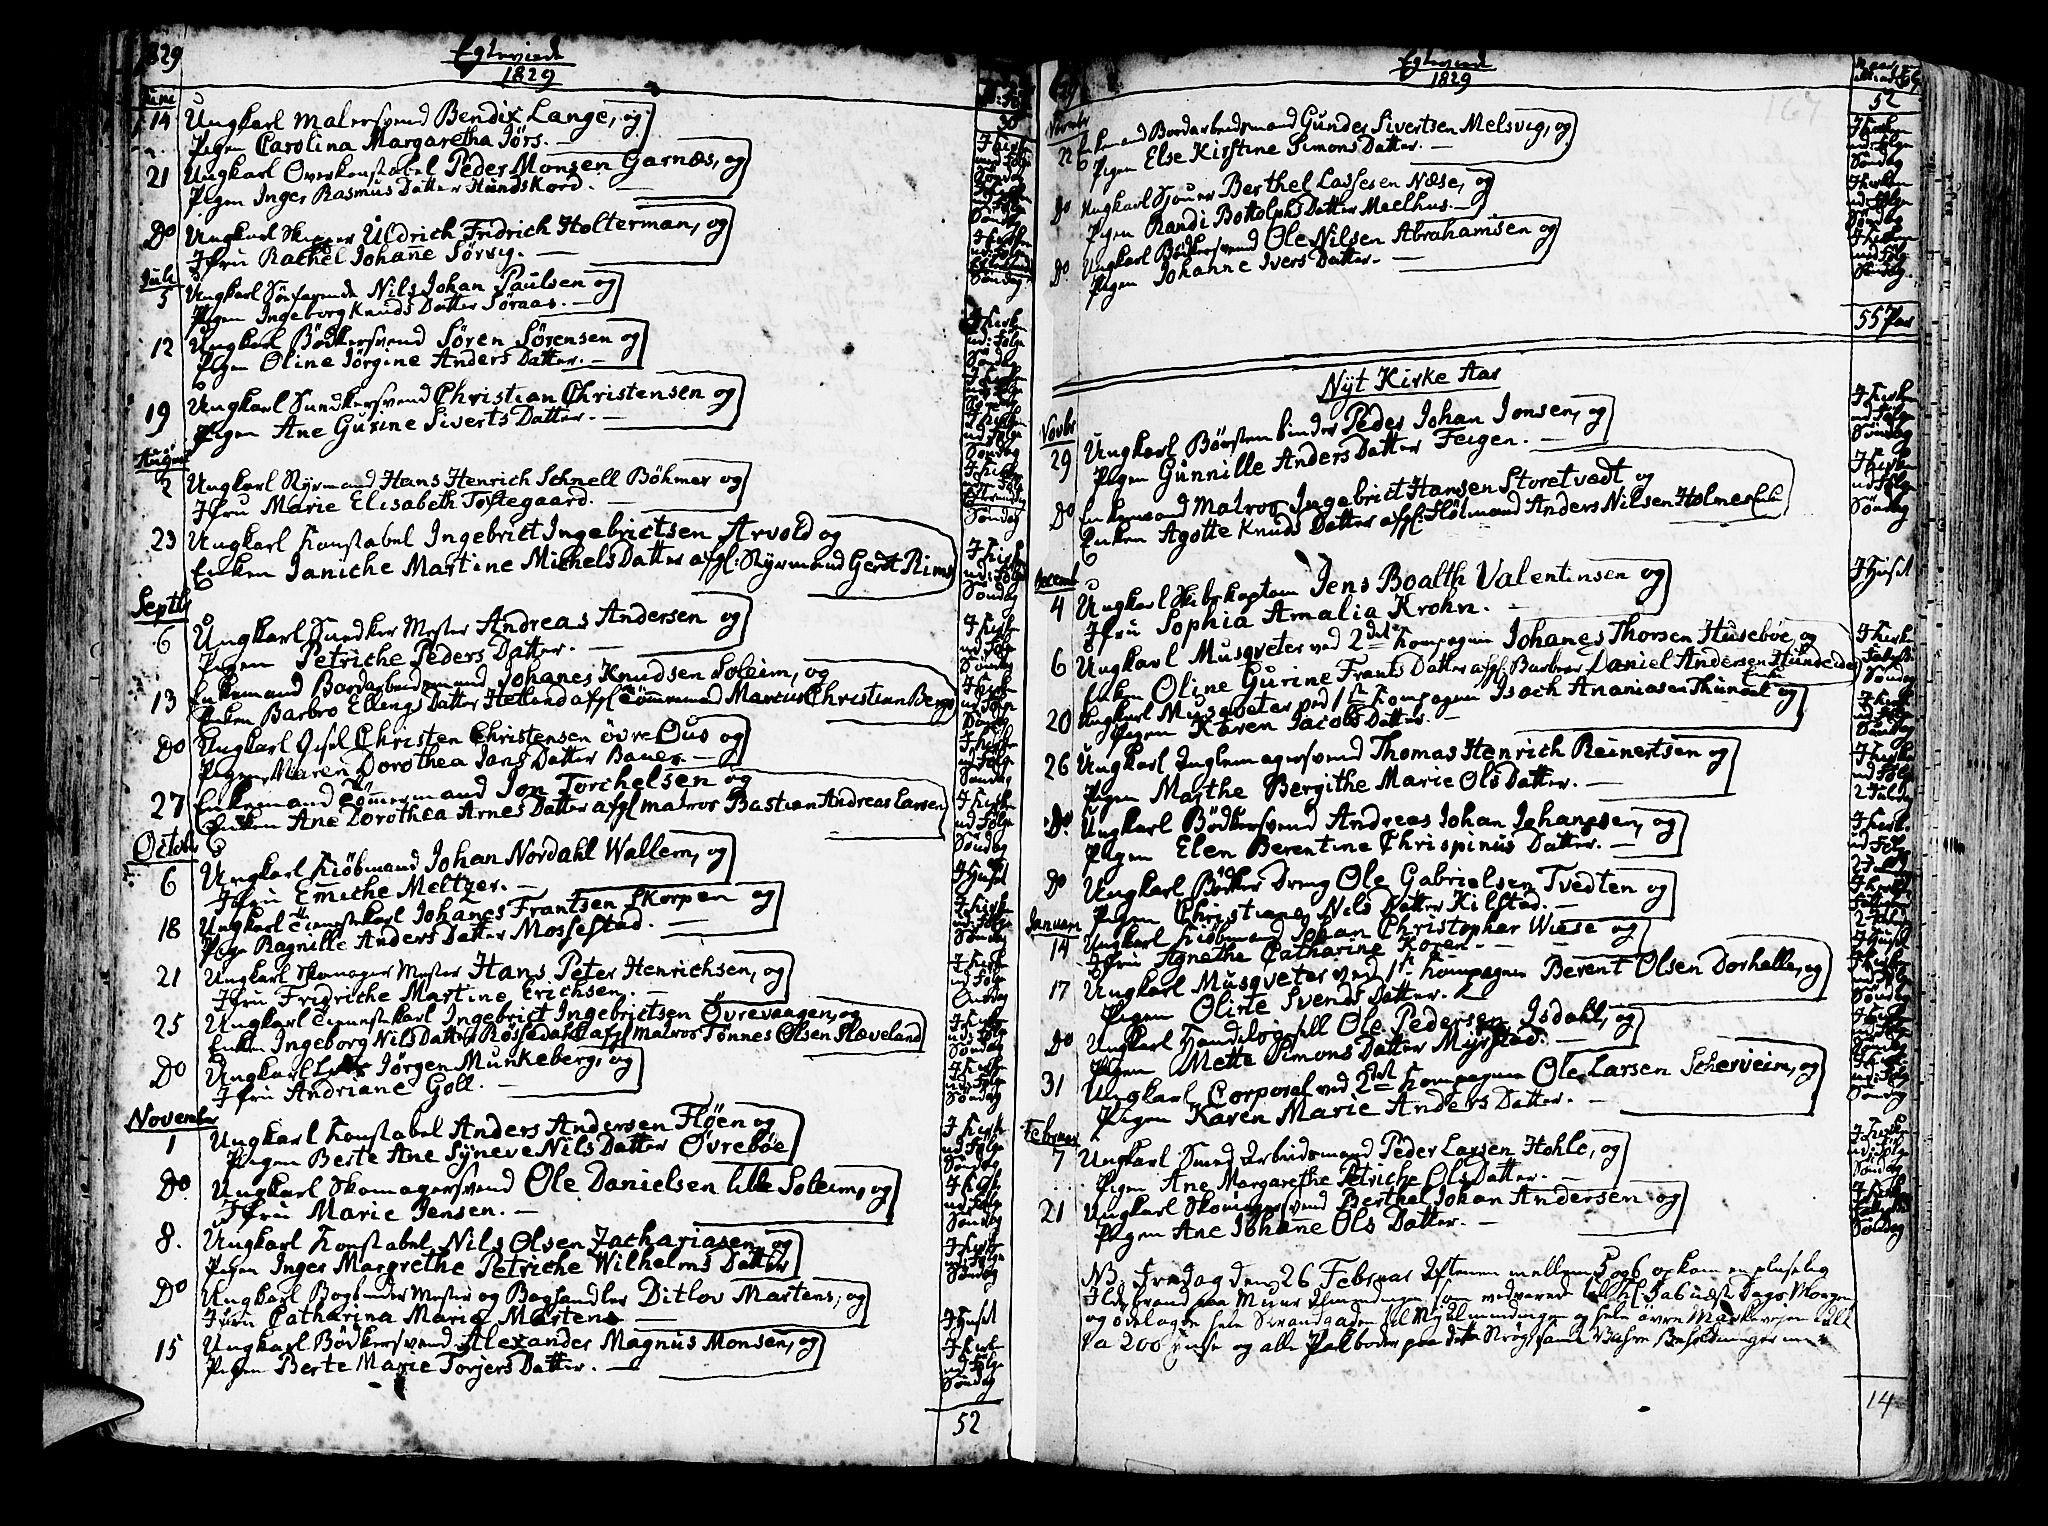 SAB, Korskirken Sokneprestembete, H/Haa/L0009: Ministerialbok nr. A 9, 1743-1861, s. 167